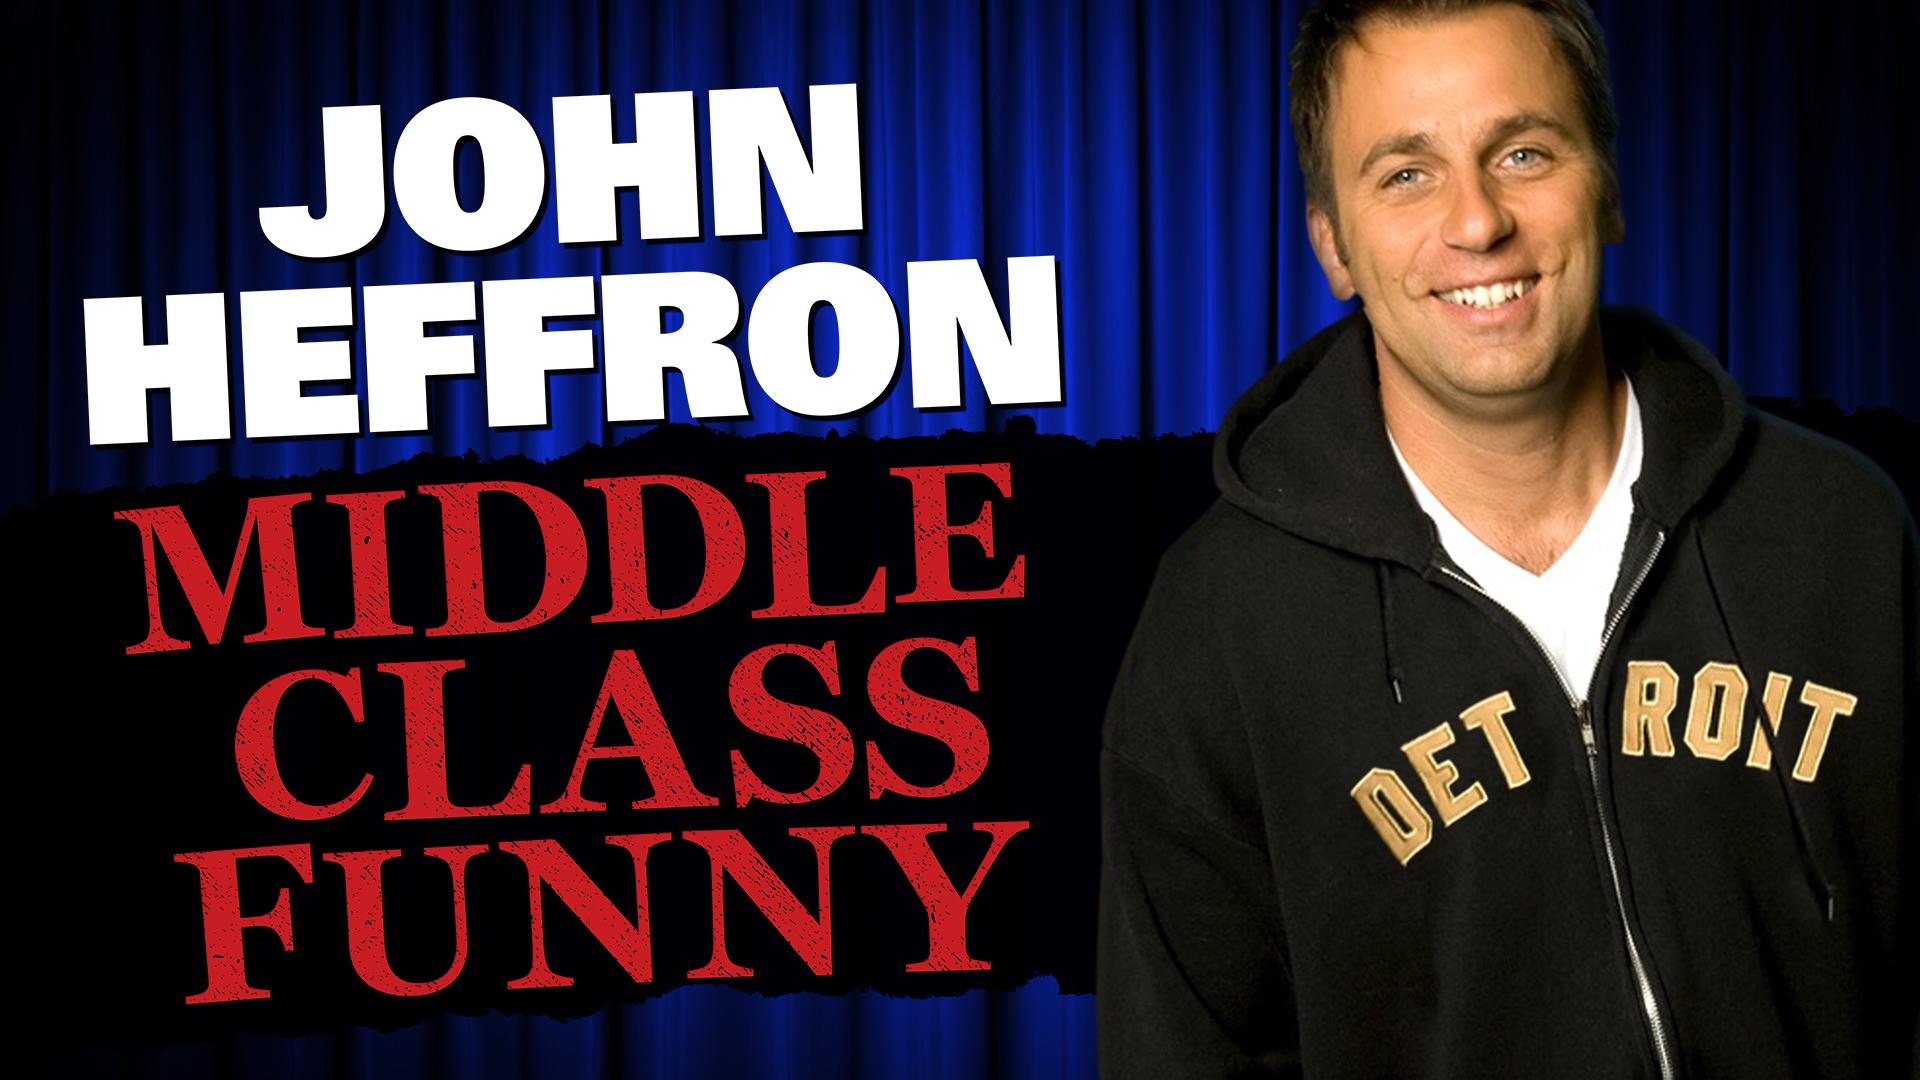 John Heffron: Middle Class Funny